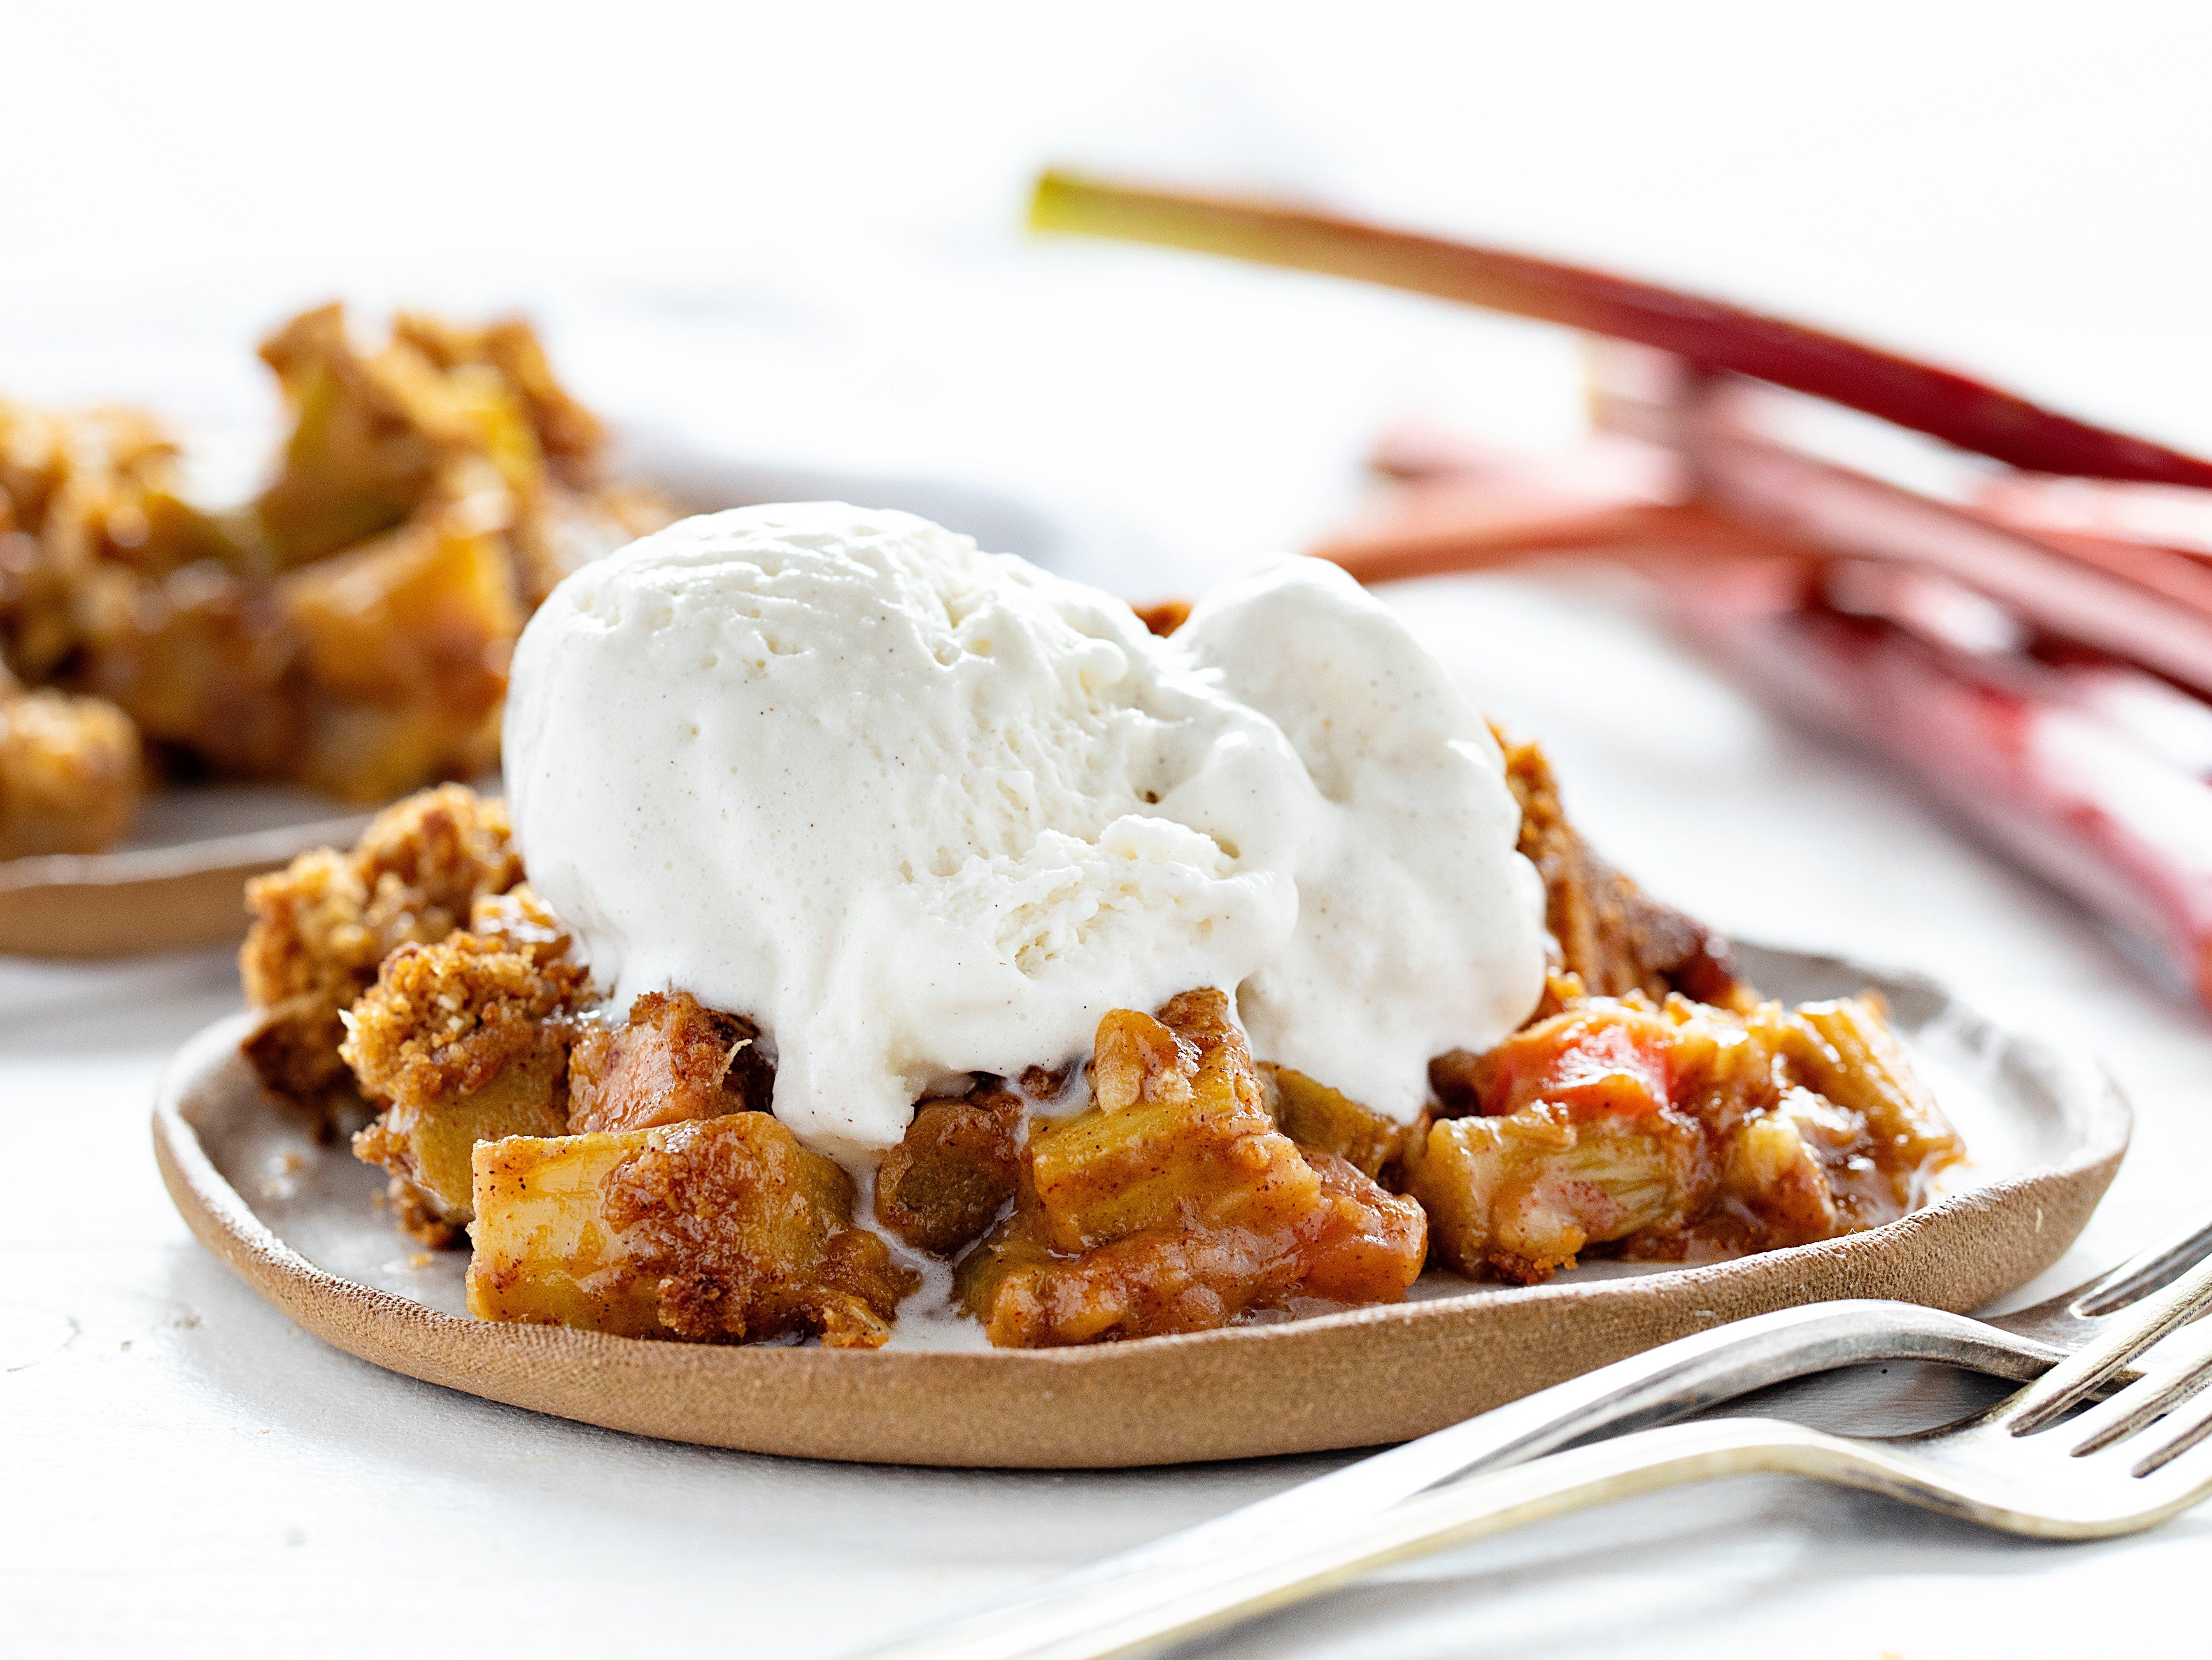 Grandma's Rhubarb Crisp